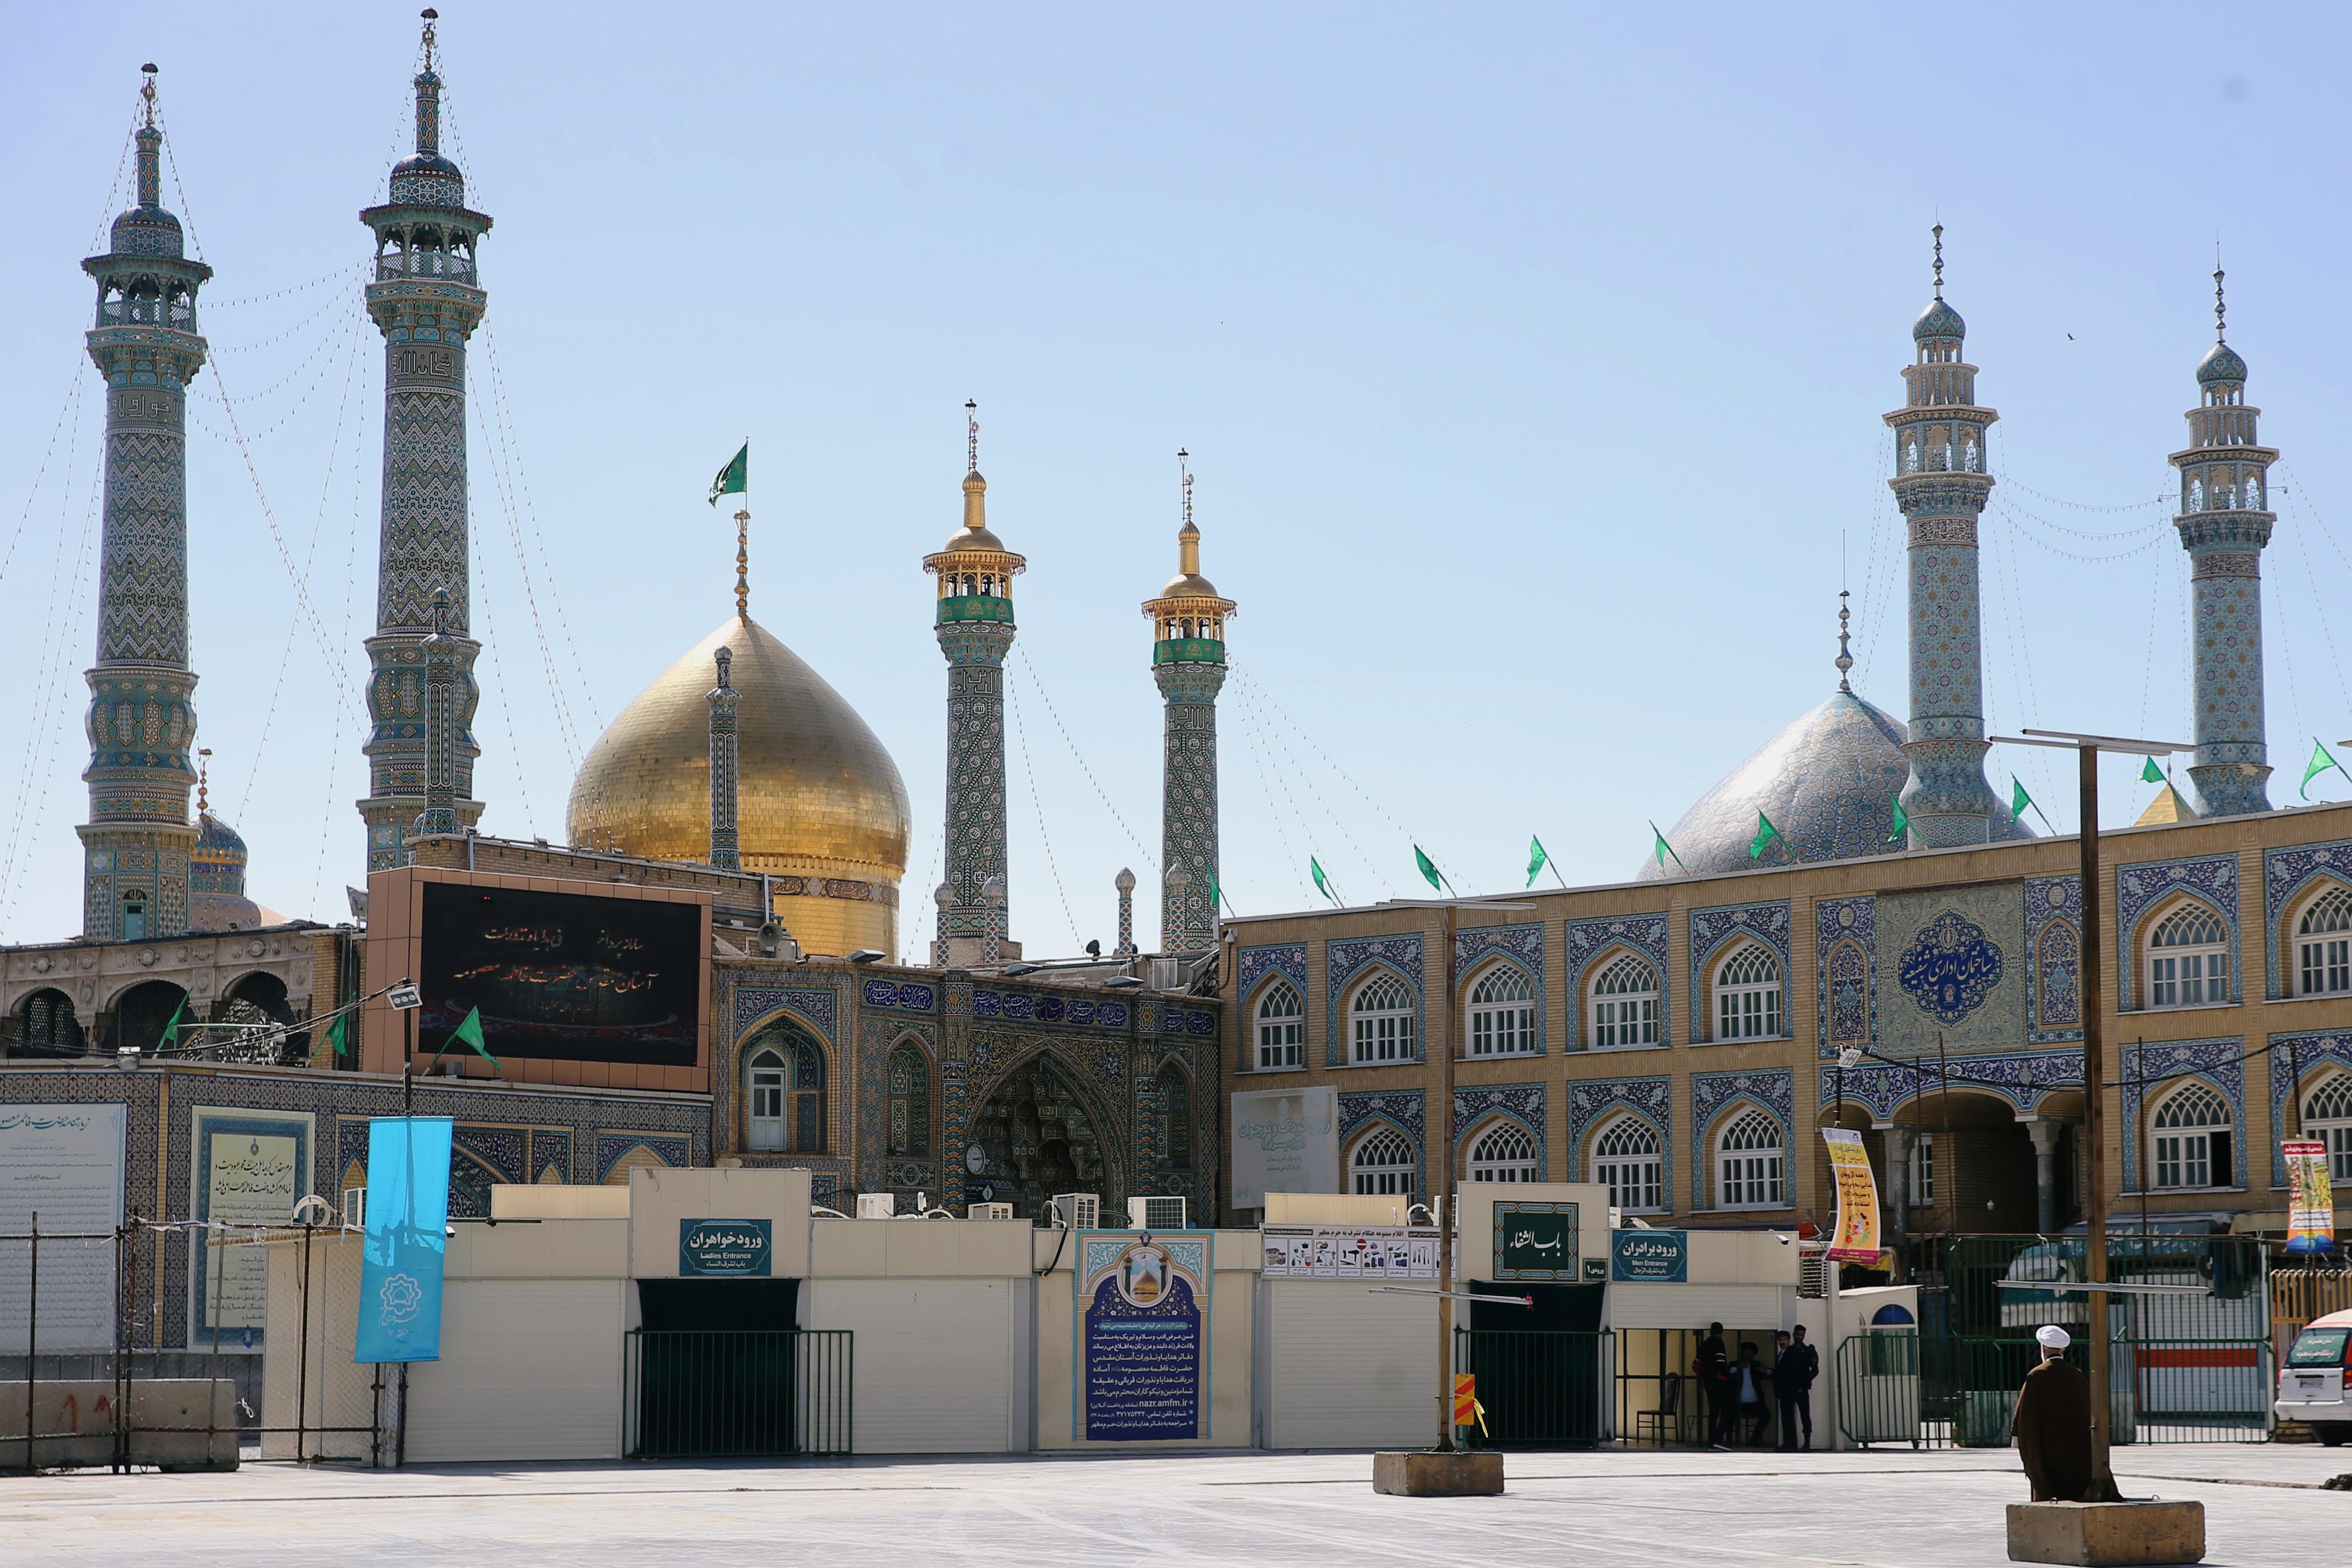 Elections, ties with China shaped Iran's coronavirus response